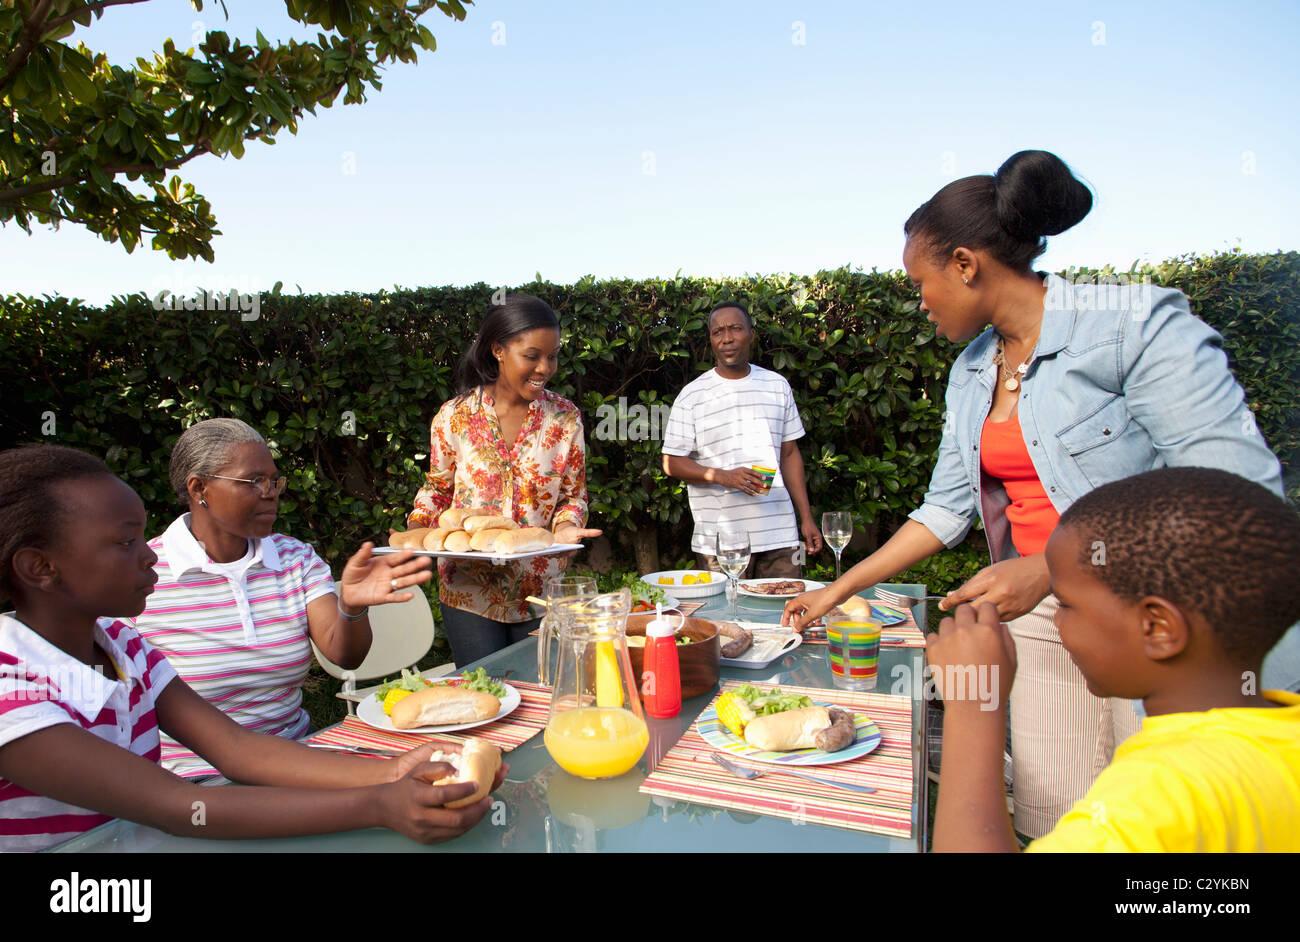 Family having lunch outside, Johannesburg, South Africa Stock Photo